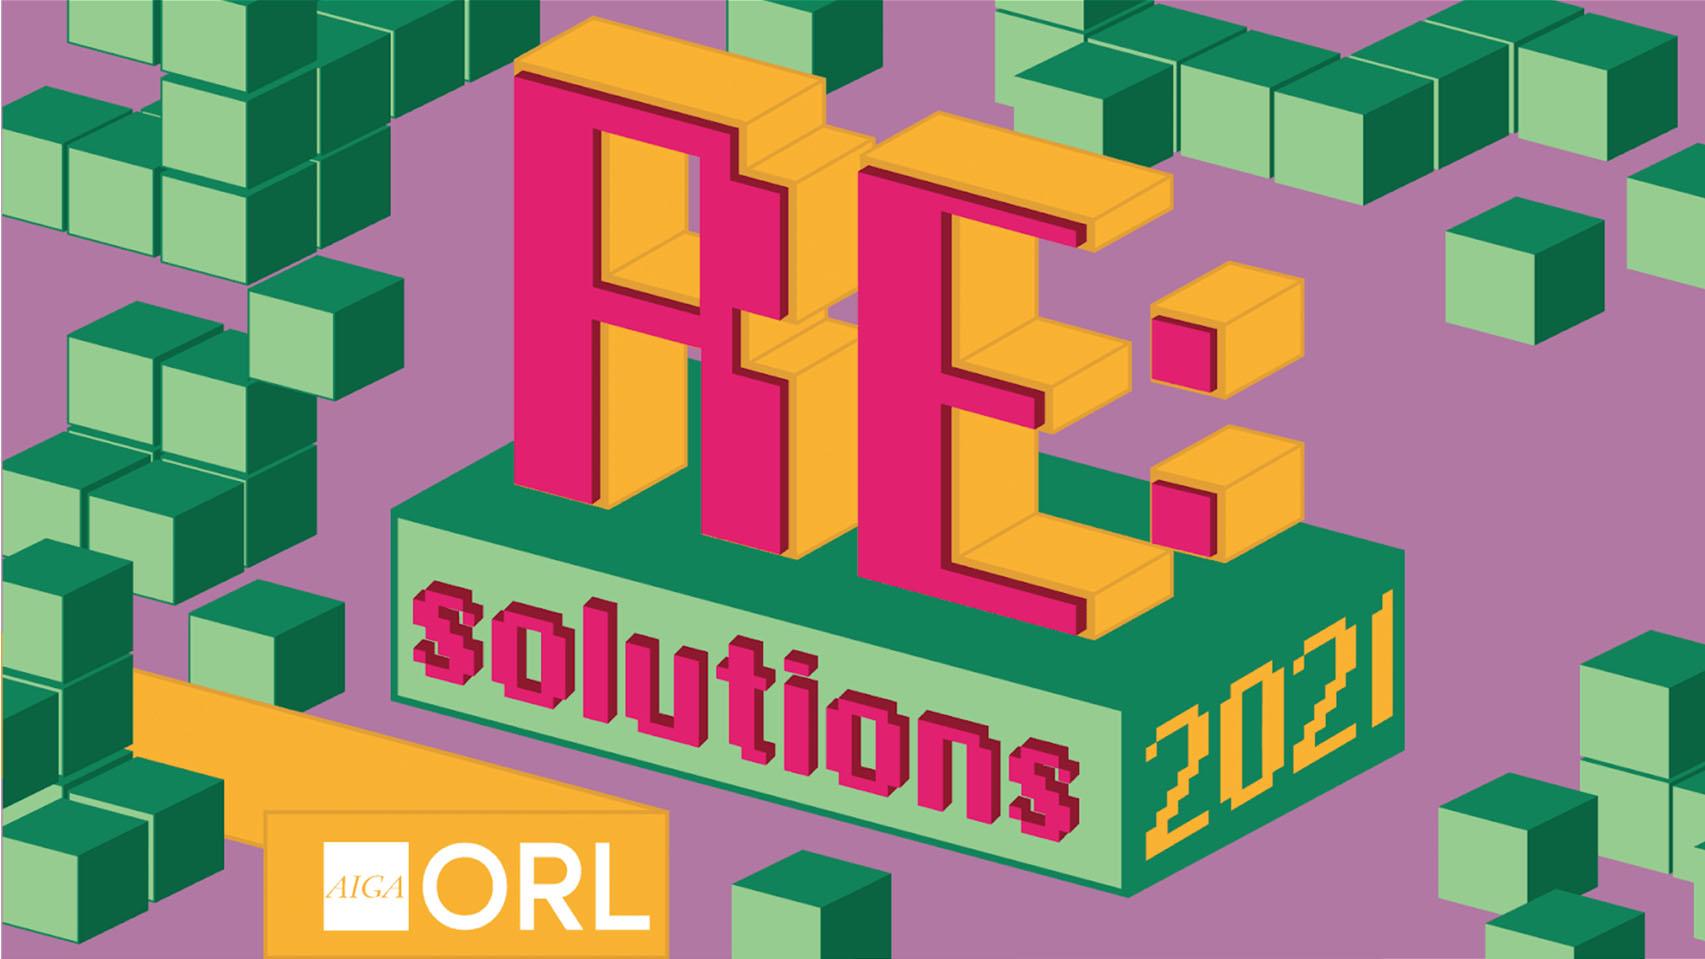 AIGA Orlando Re:Solutions Conference illustration